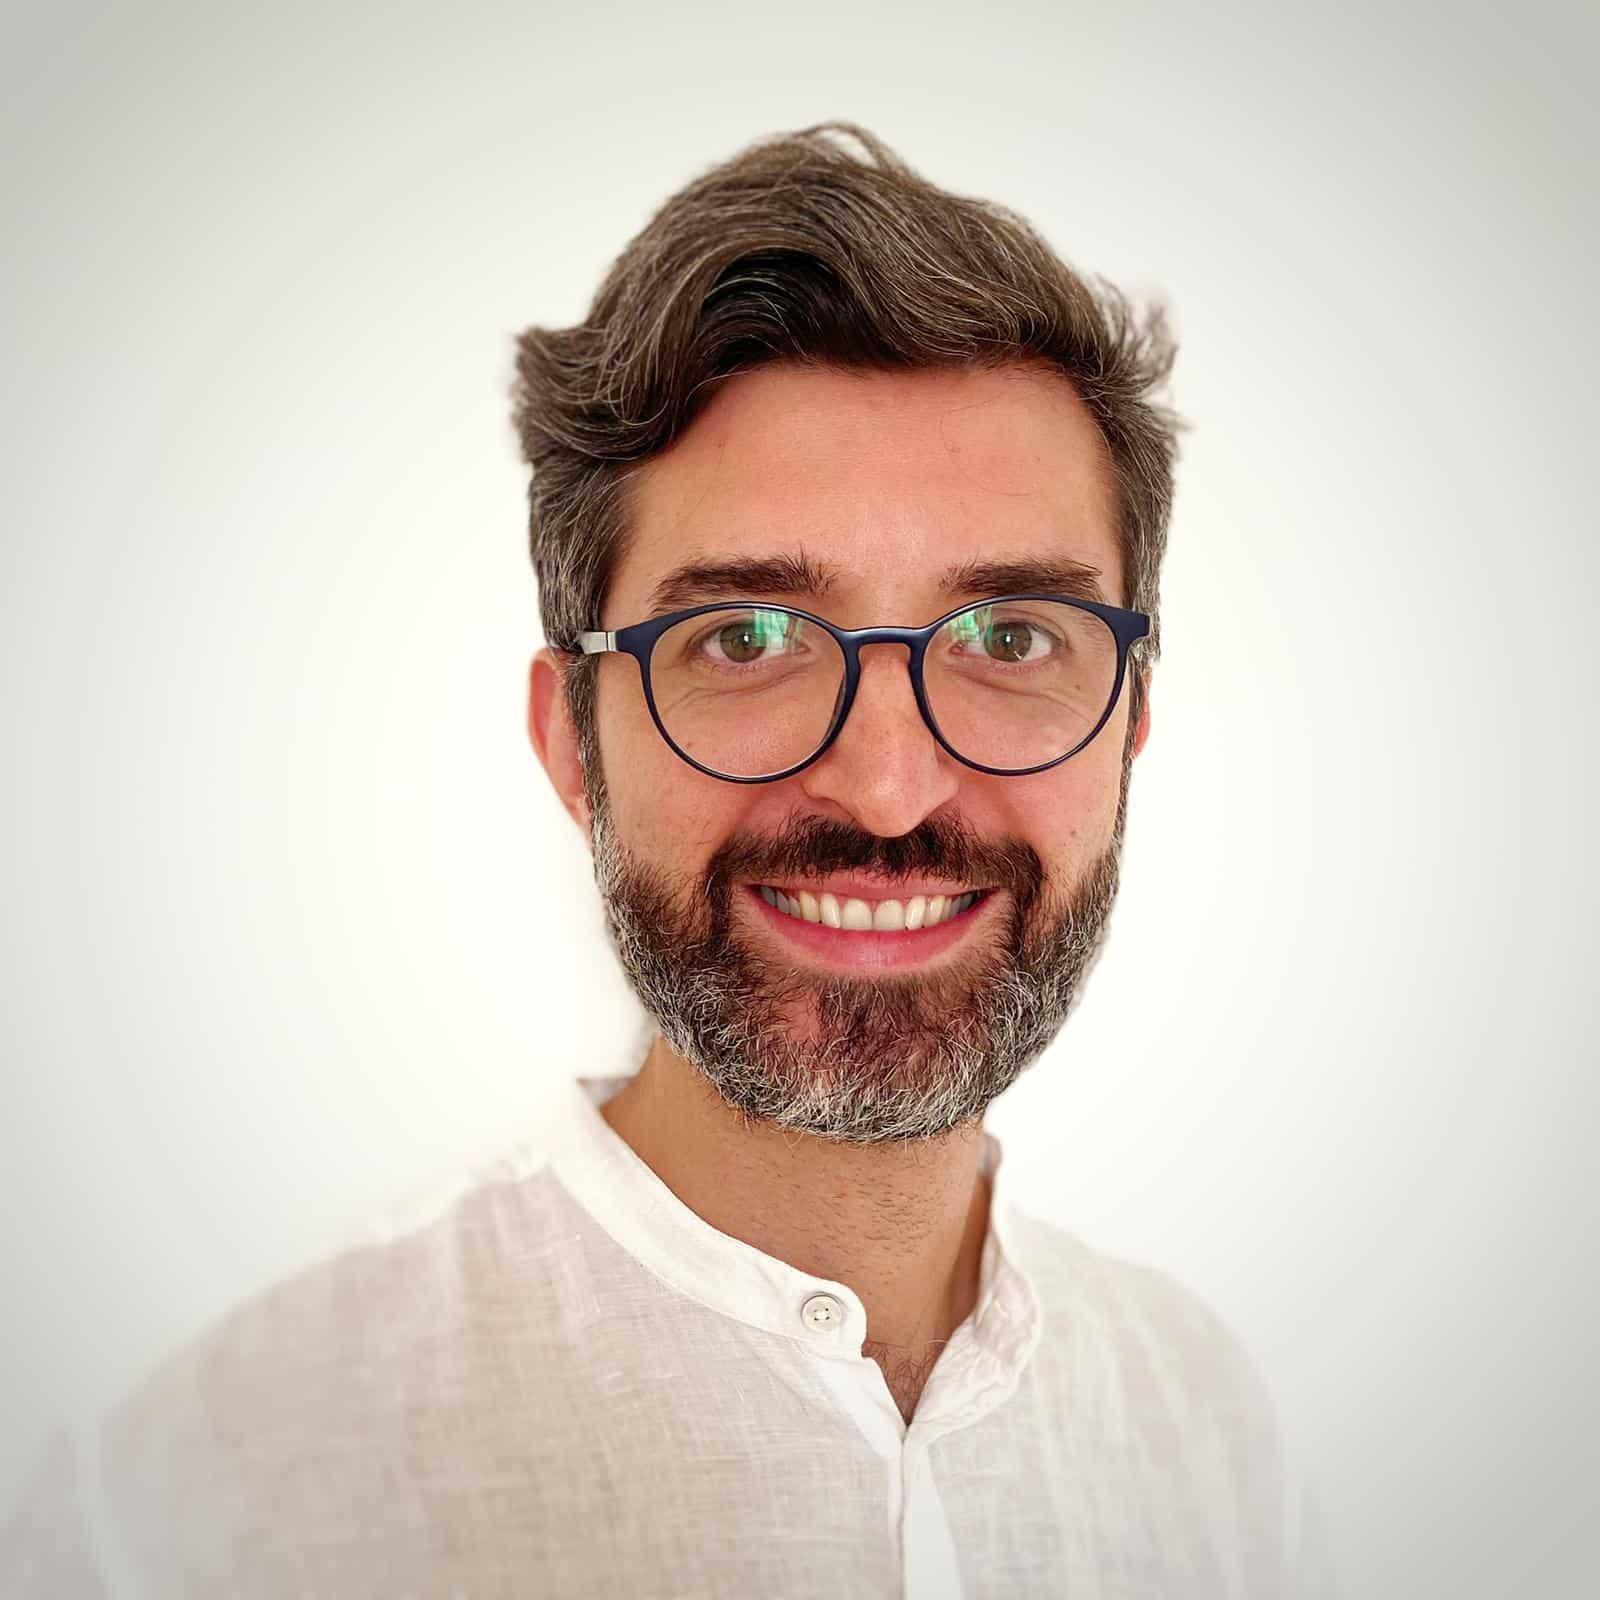 Gaetano Crivello